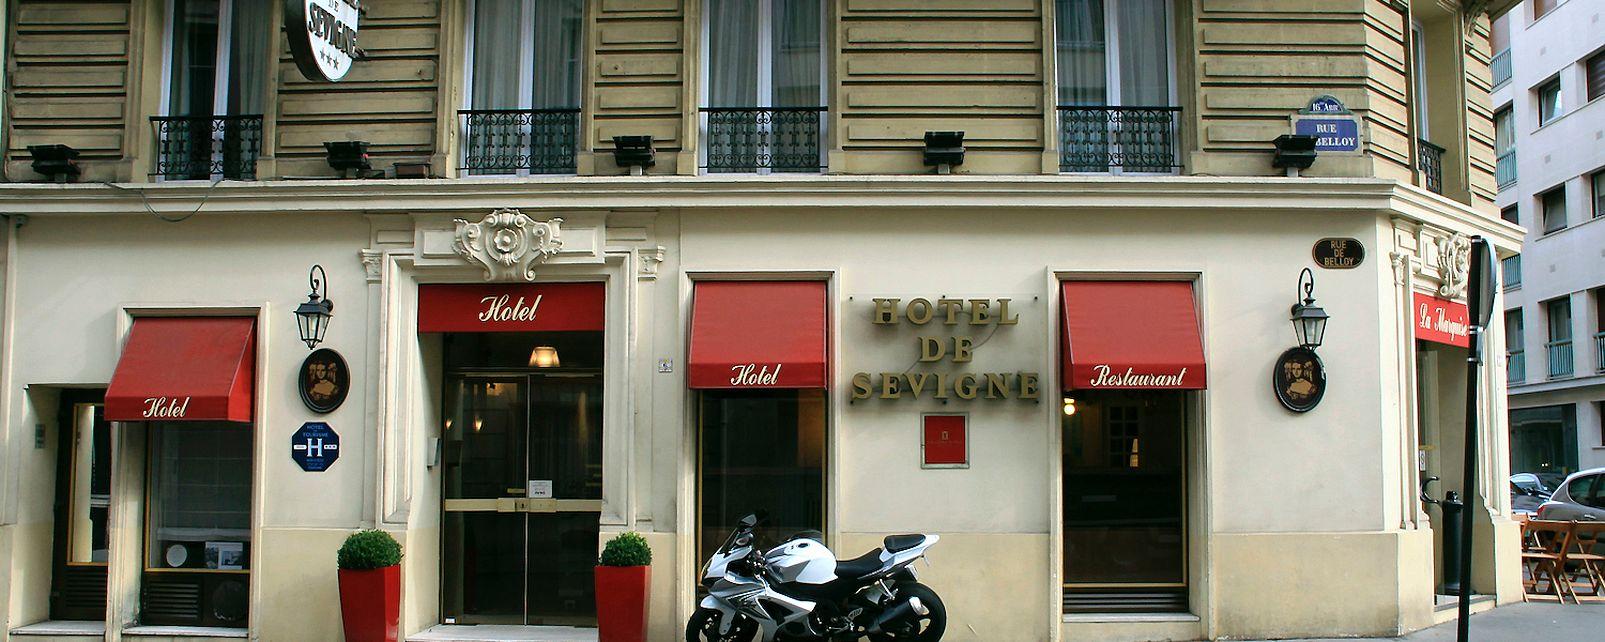 Hotel De Sevigné